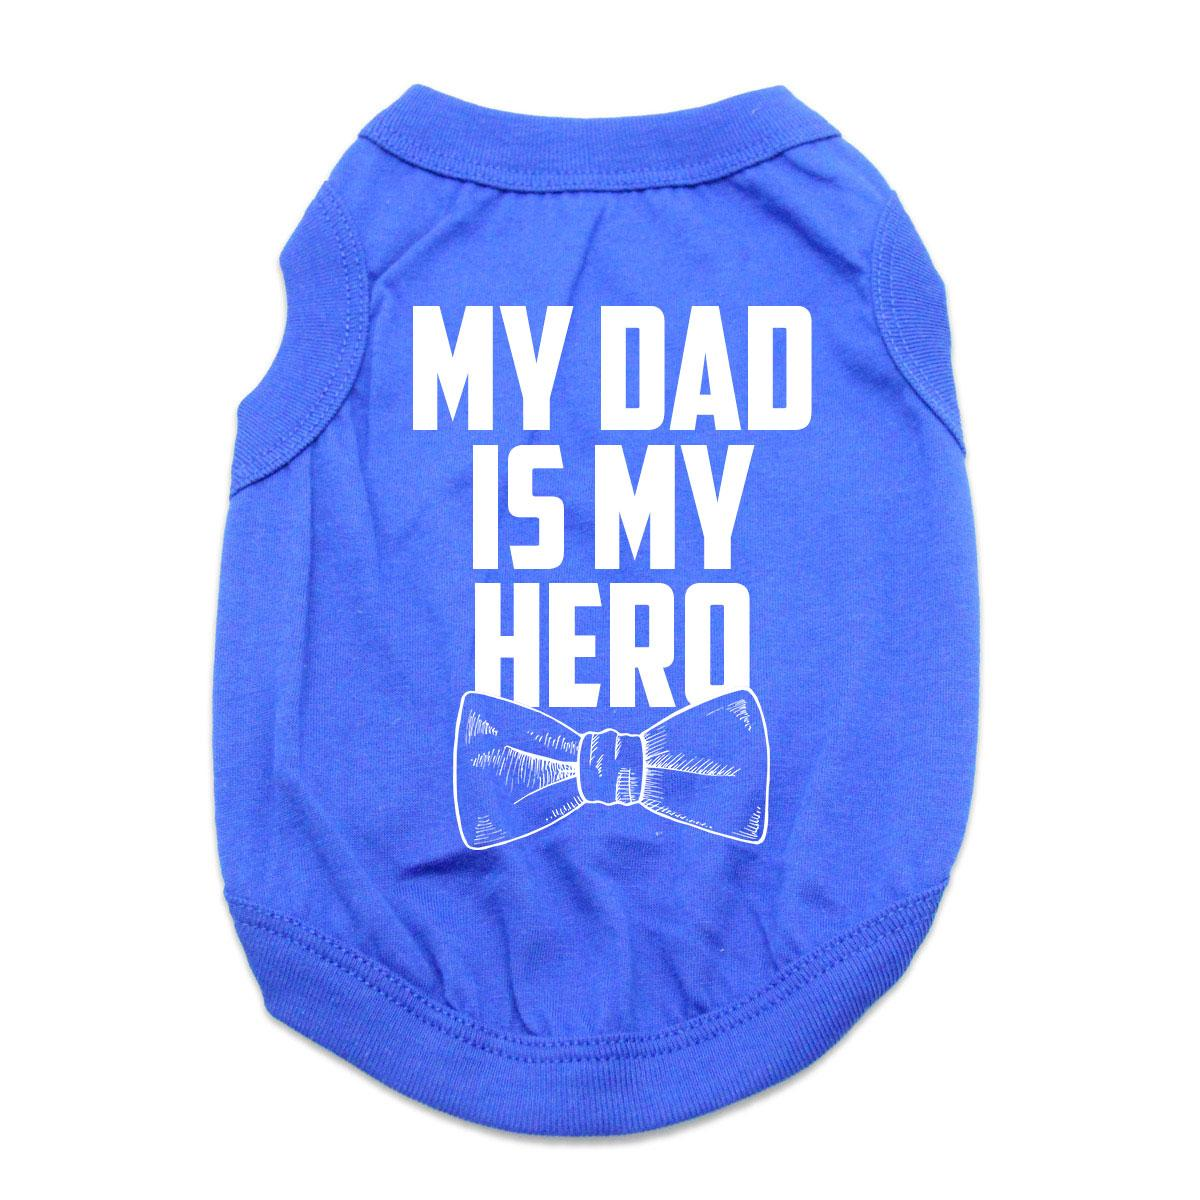 My Dad is My Hero Dog Shirt - Blue